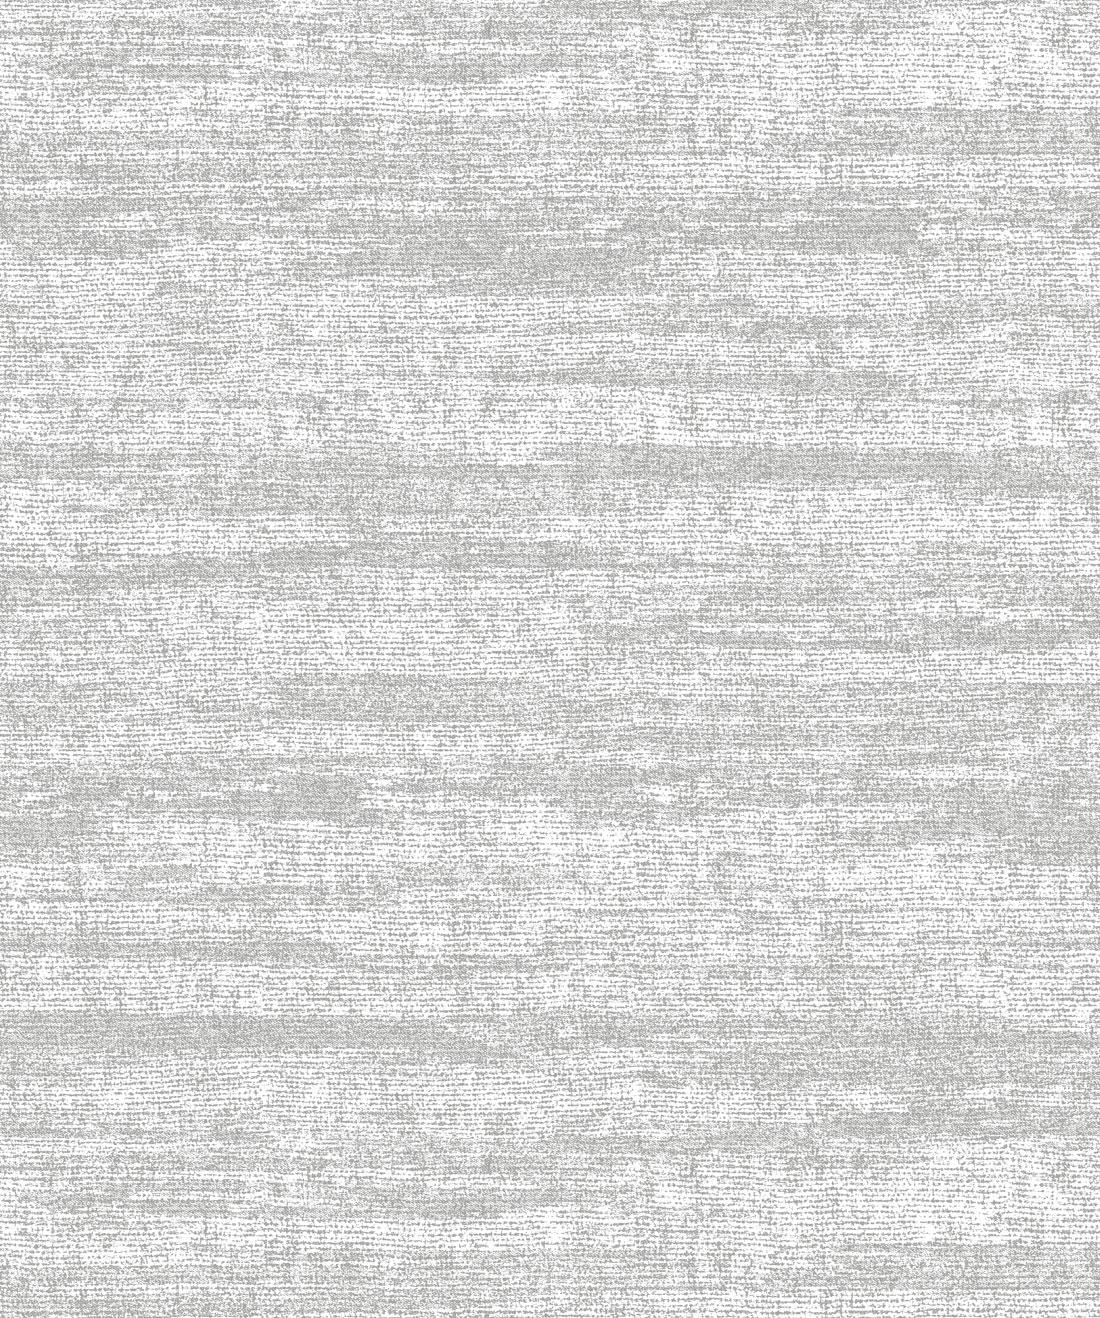 Interwoven Wallpaper